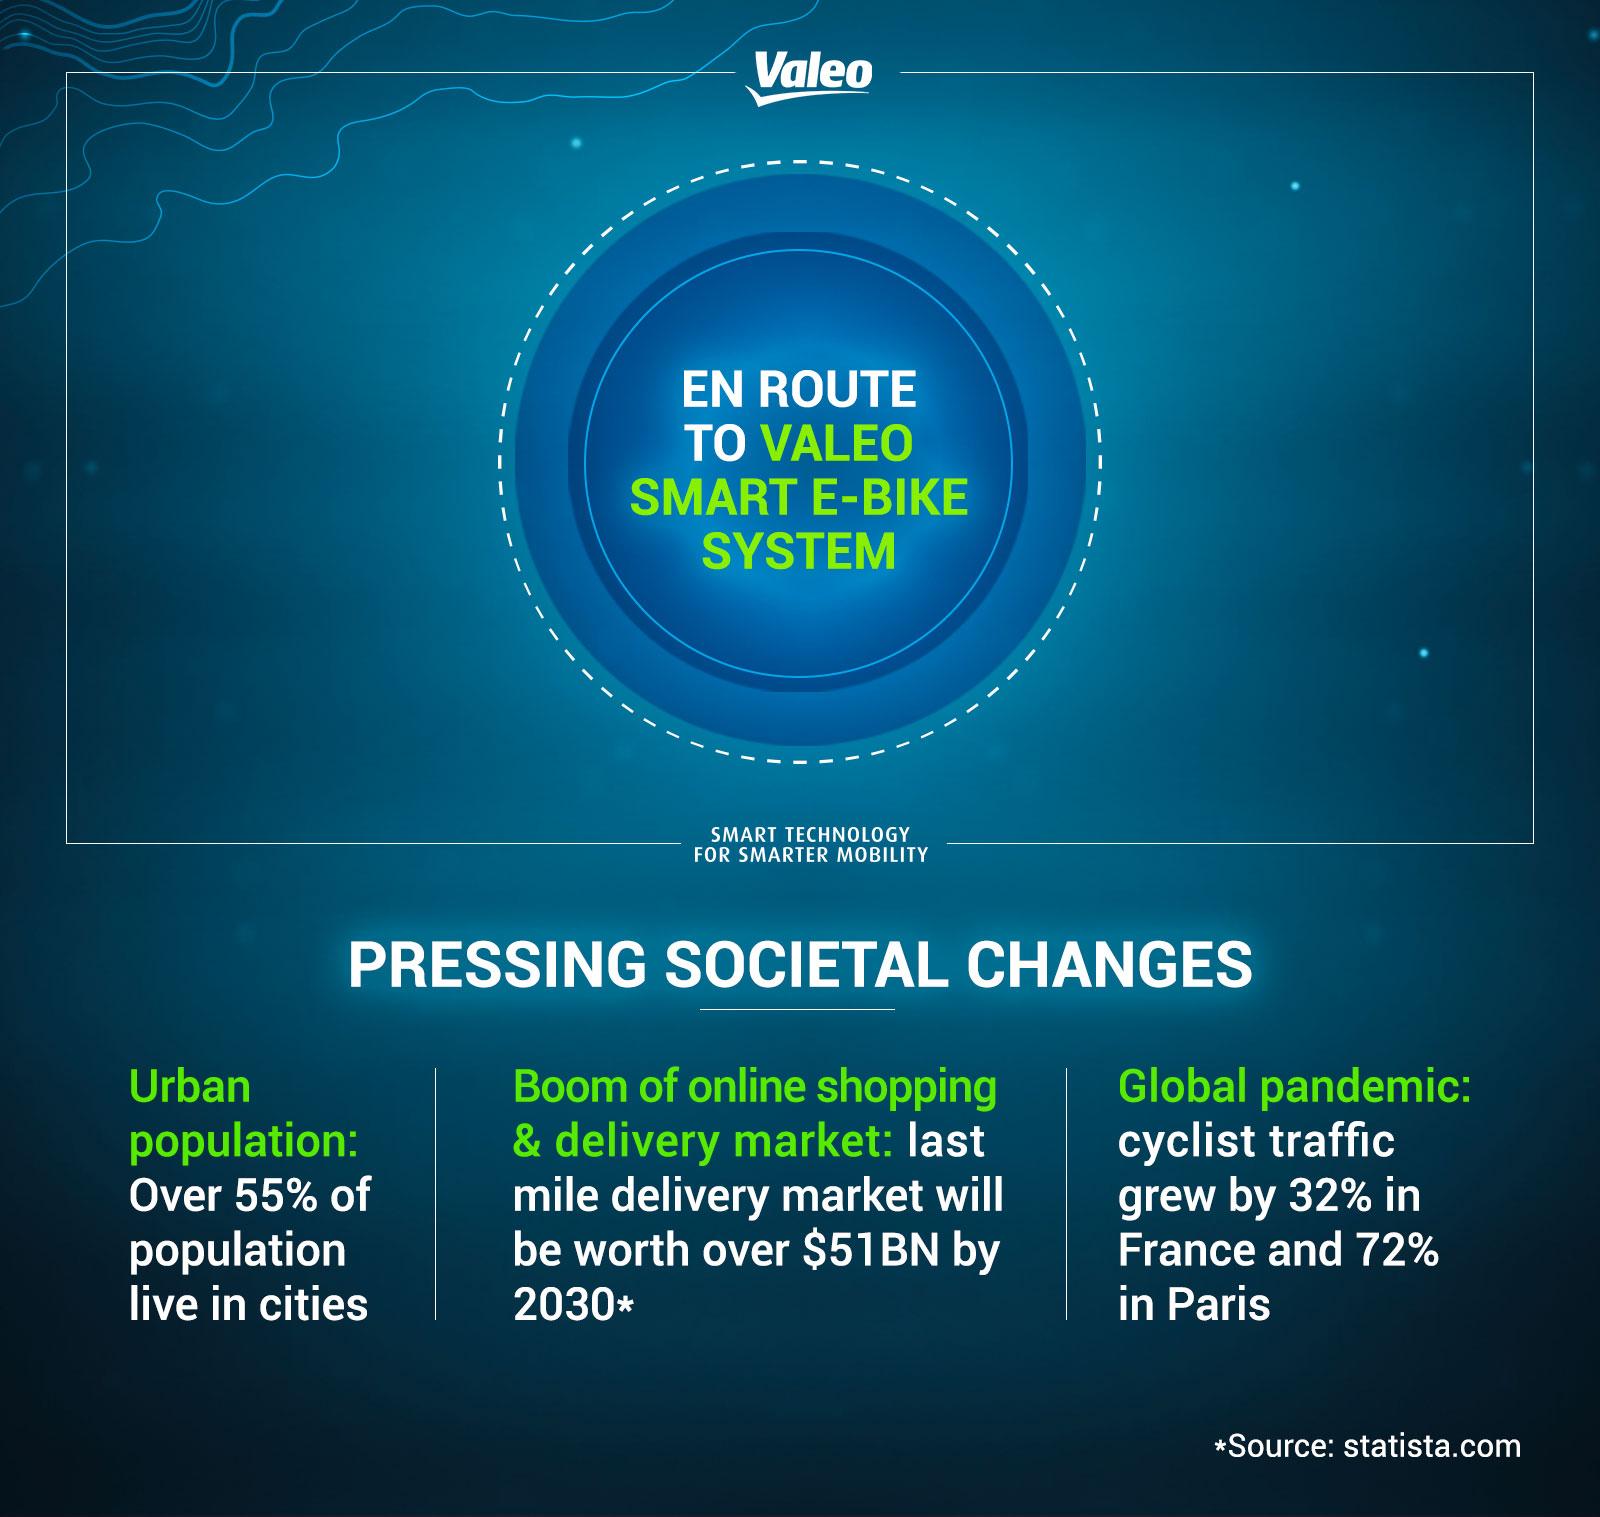 En_route-to_Valeo_smart_e-bike_system_1600_1517